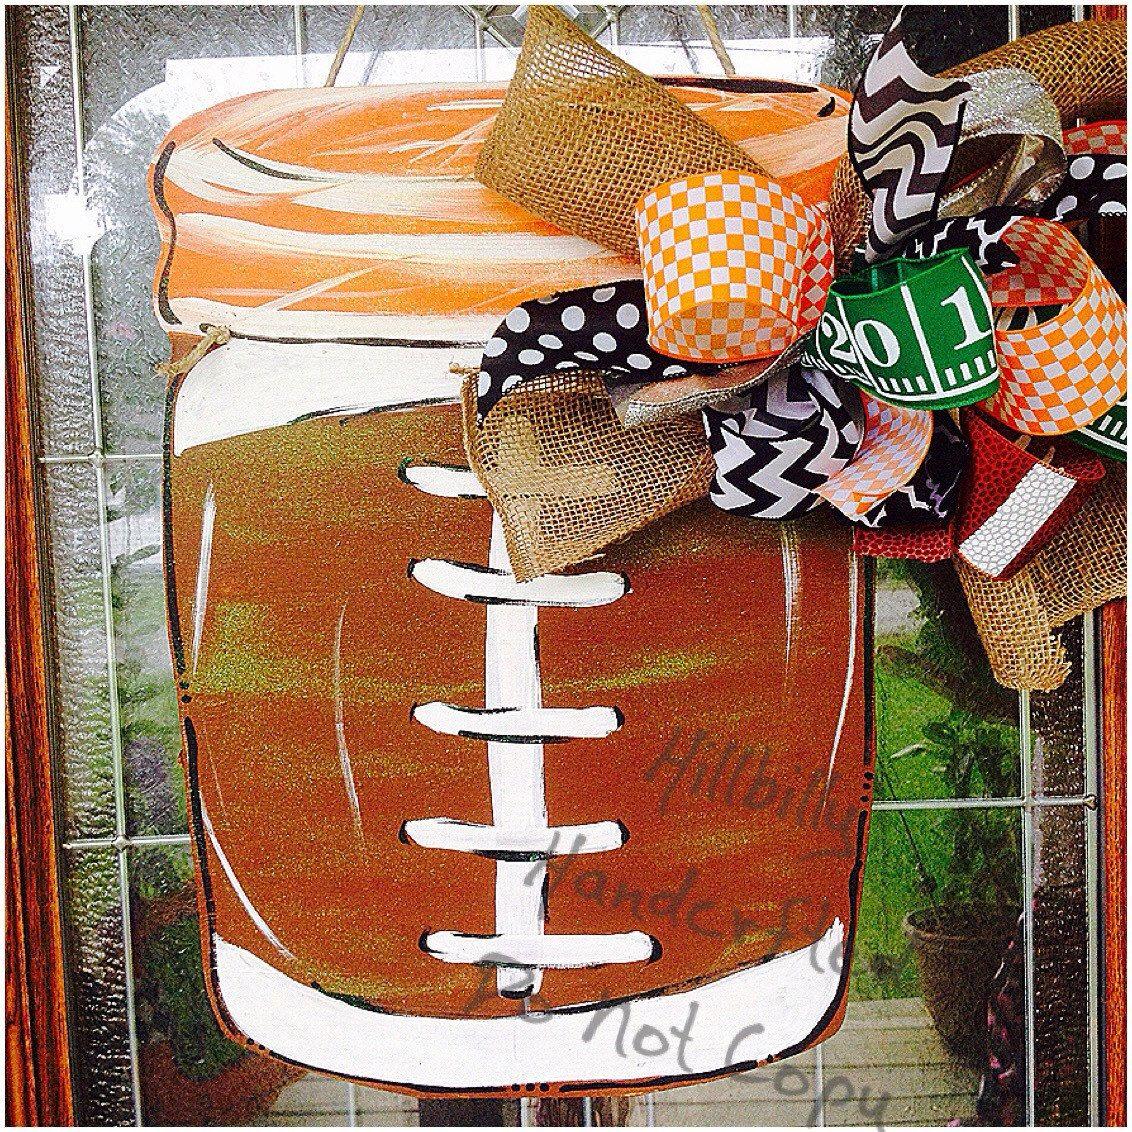 Football Season Tennessee Vols Football Mason Jar Sports Door Hanger Football Door Hangers Mason Jar Crafts Wooden Door Hangers